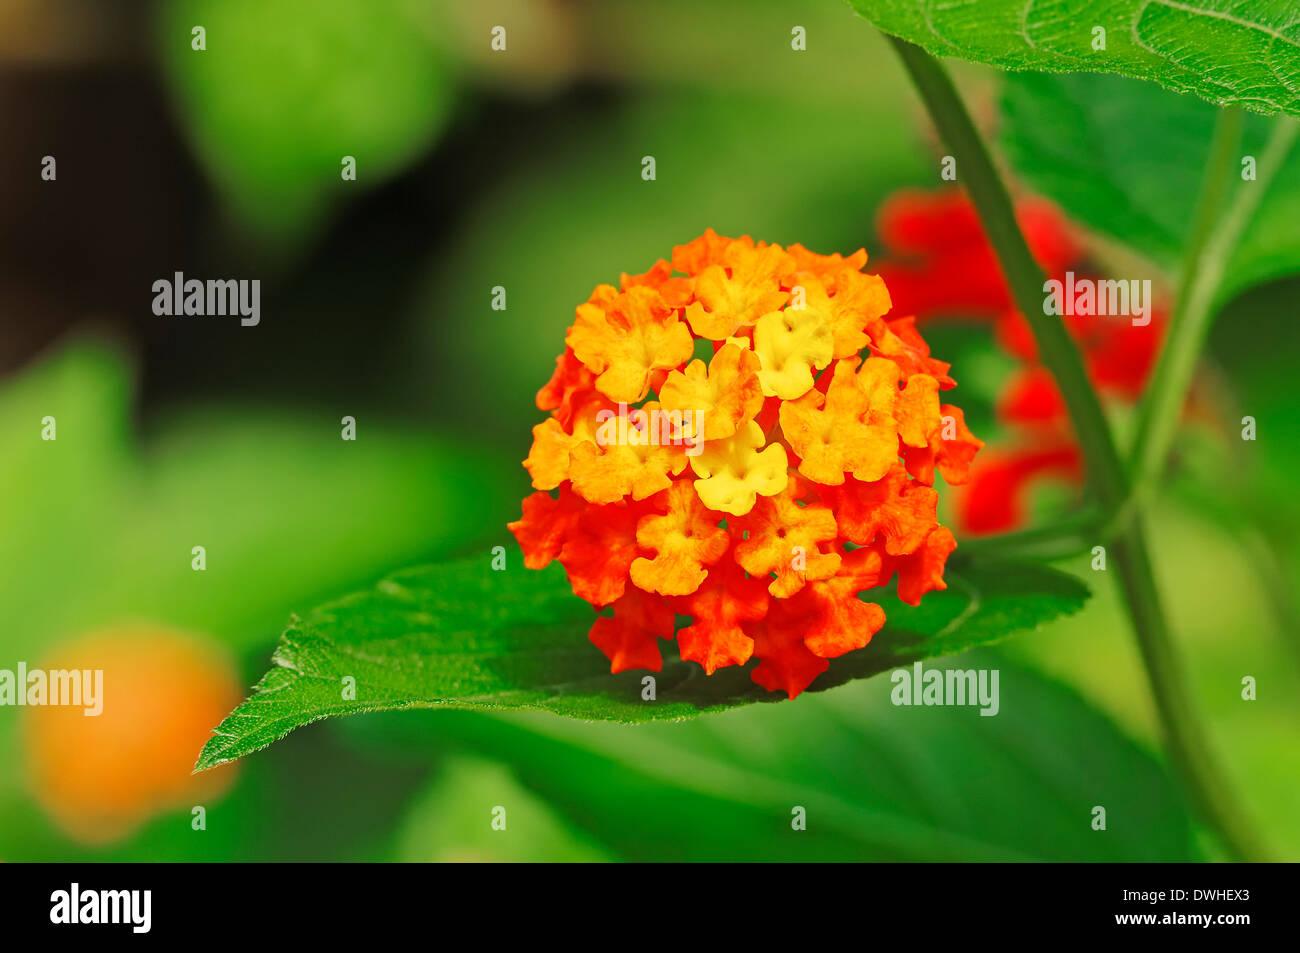 Common Lantana or Shrub Verbena (Lantana camara) - Stock Image